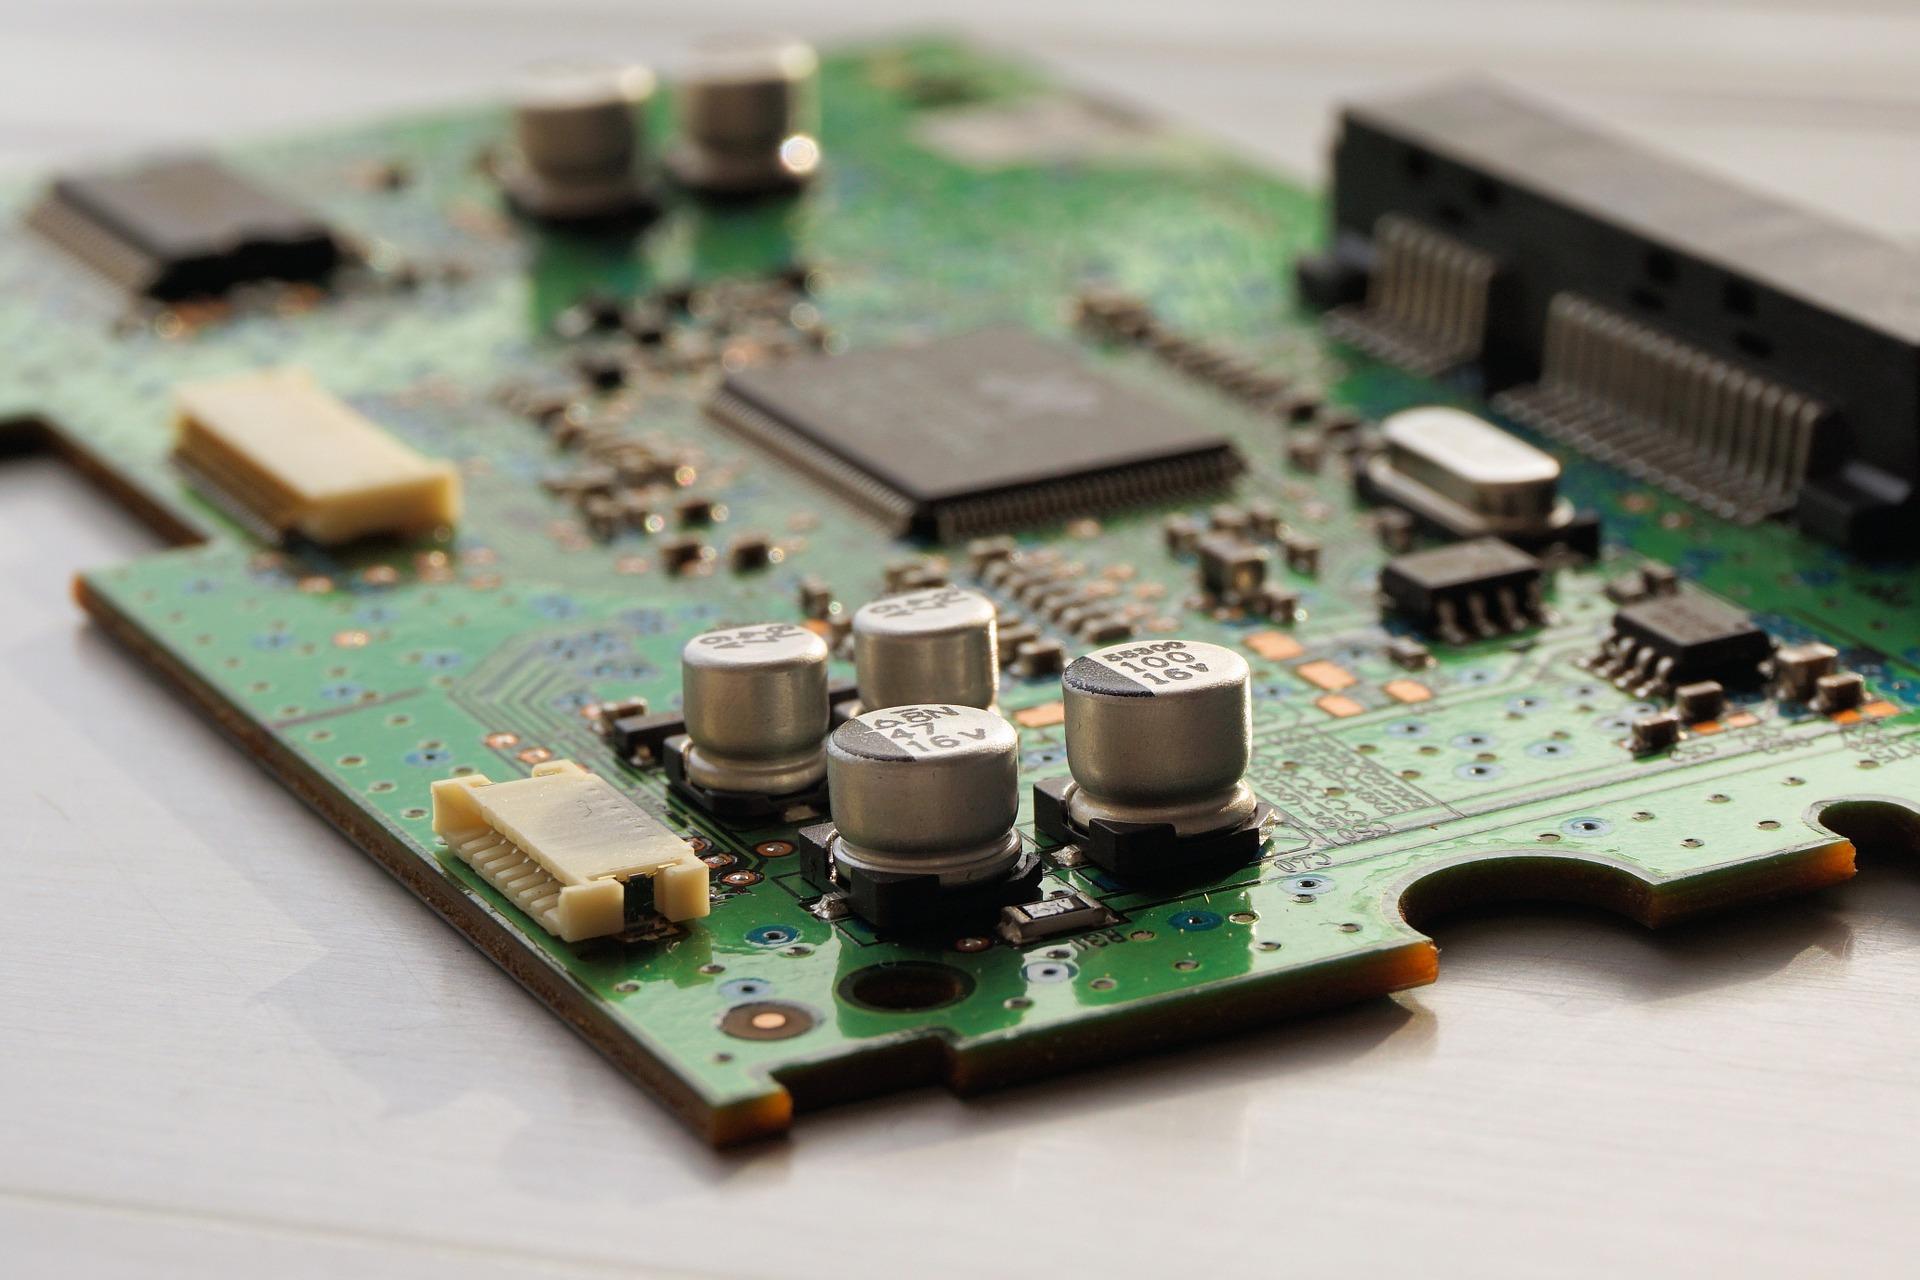 STM32F407 Discovery - Blinky LED (Deep C)